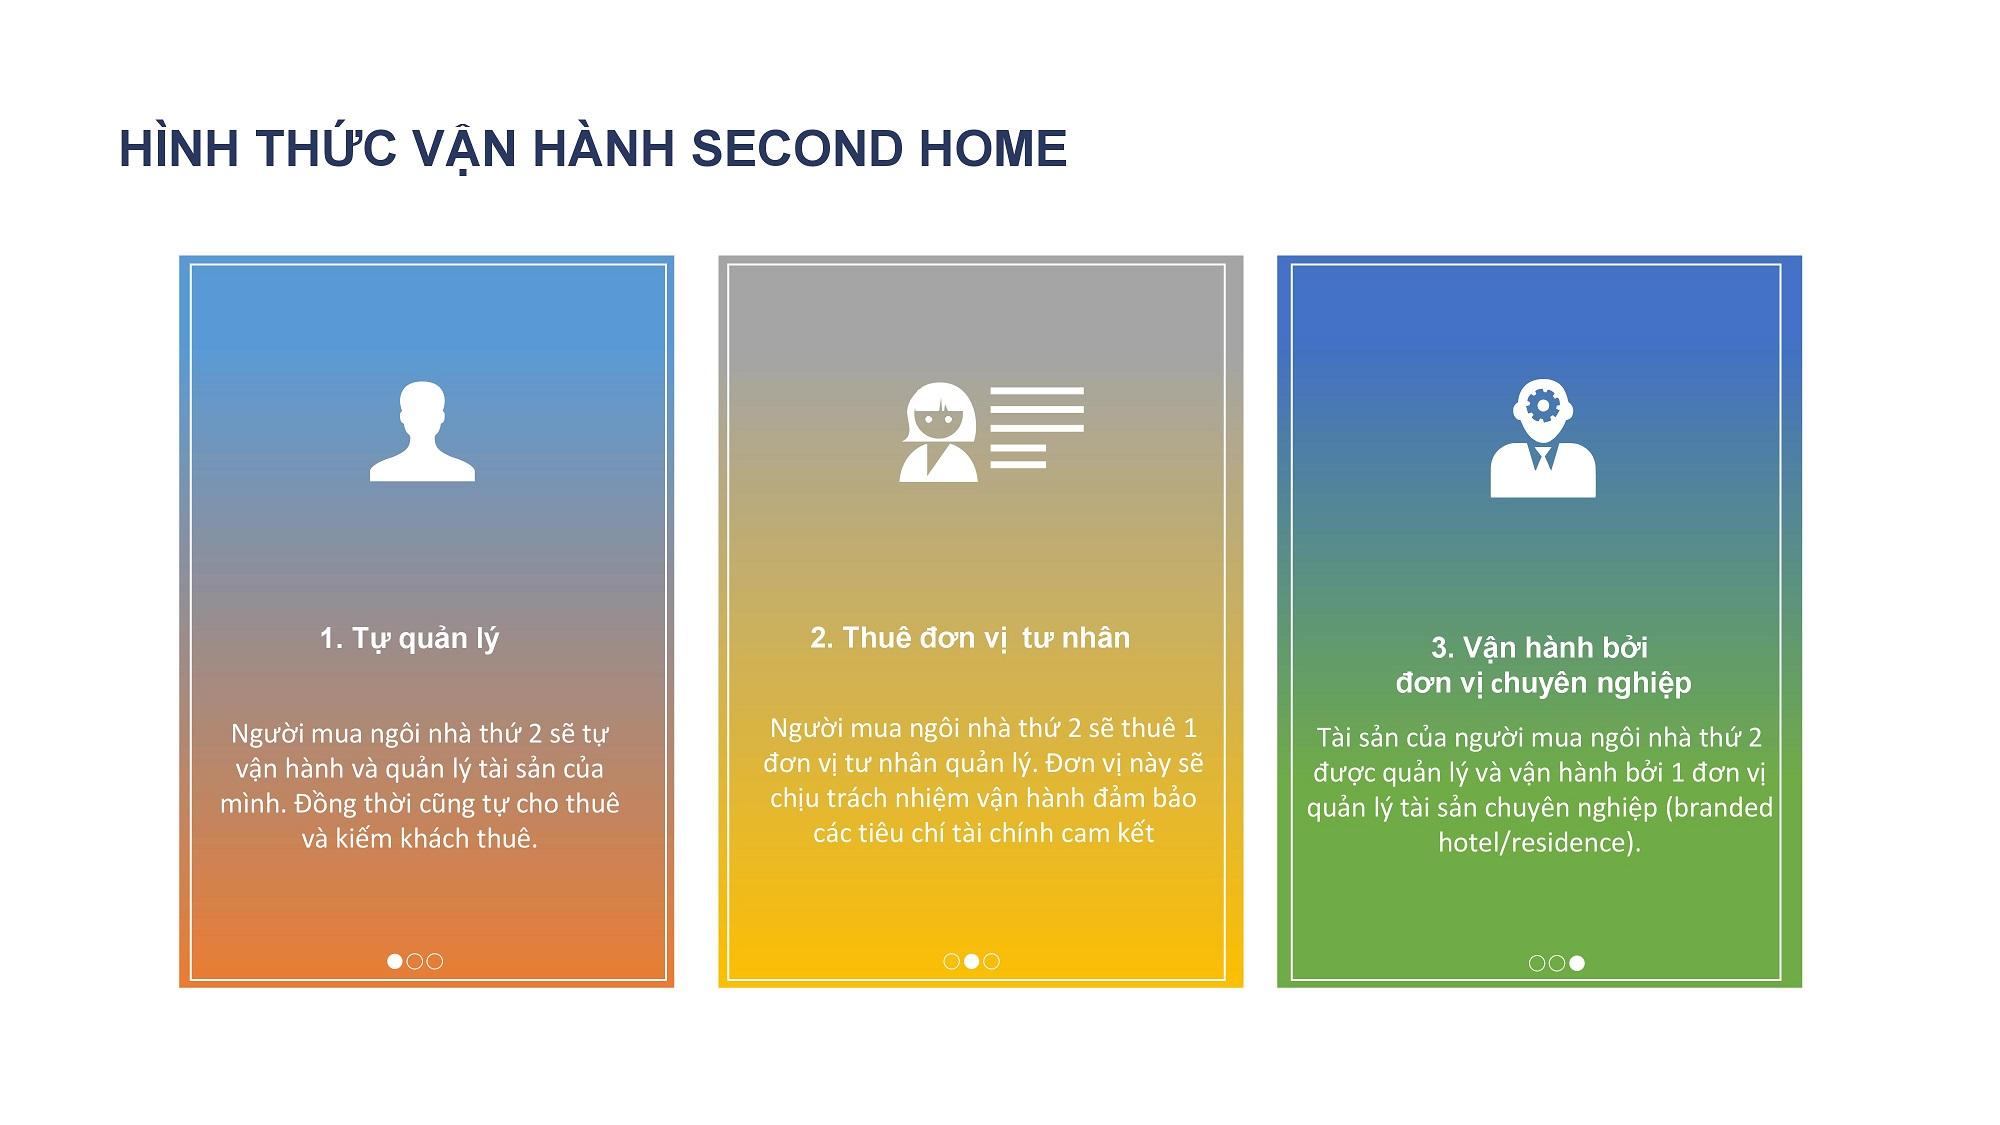 hinh-thuc-van-hanh-second-home